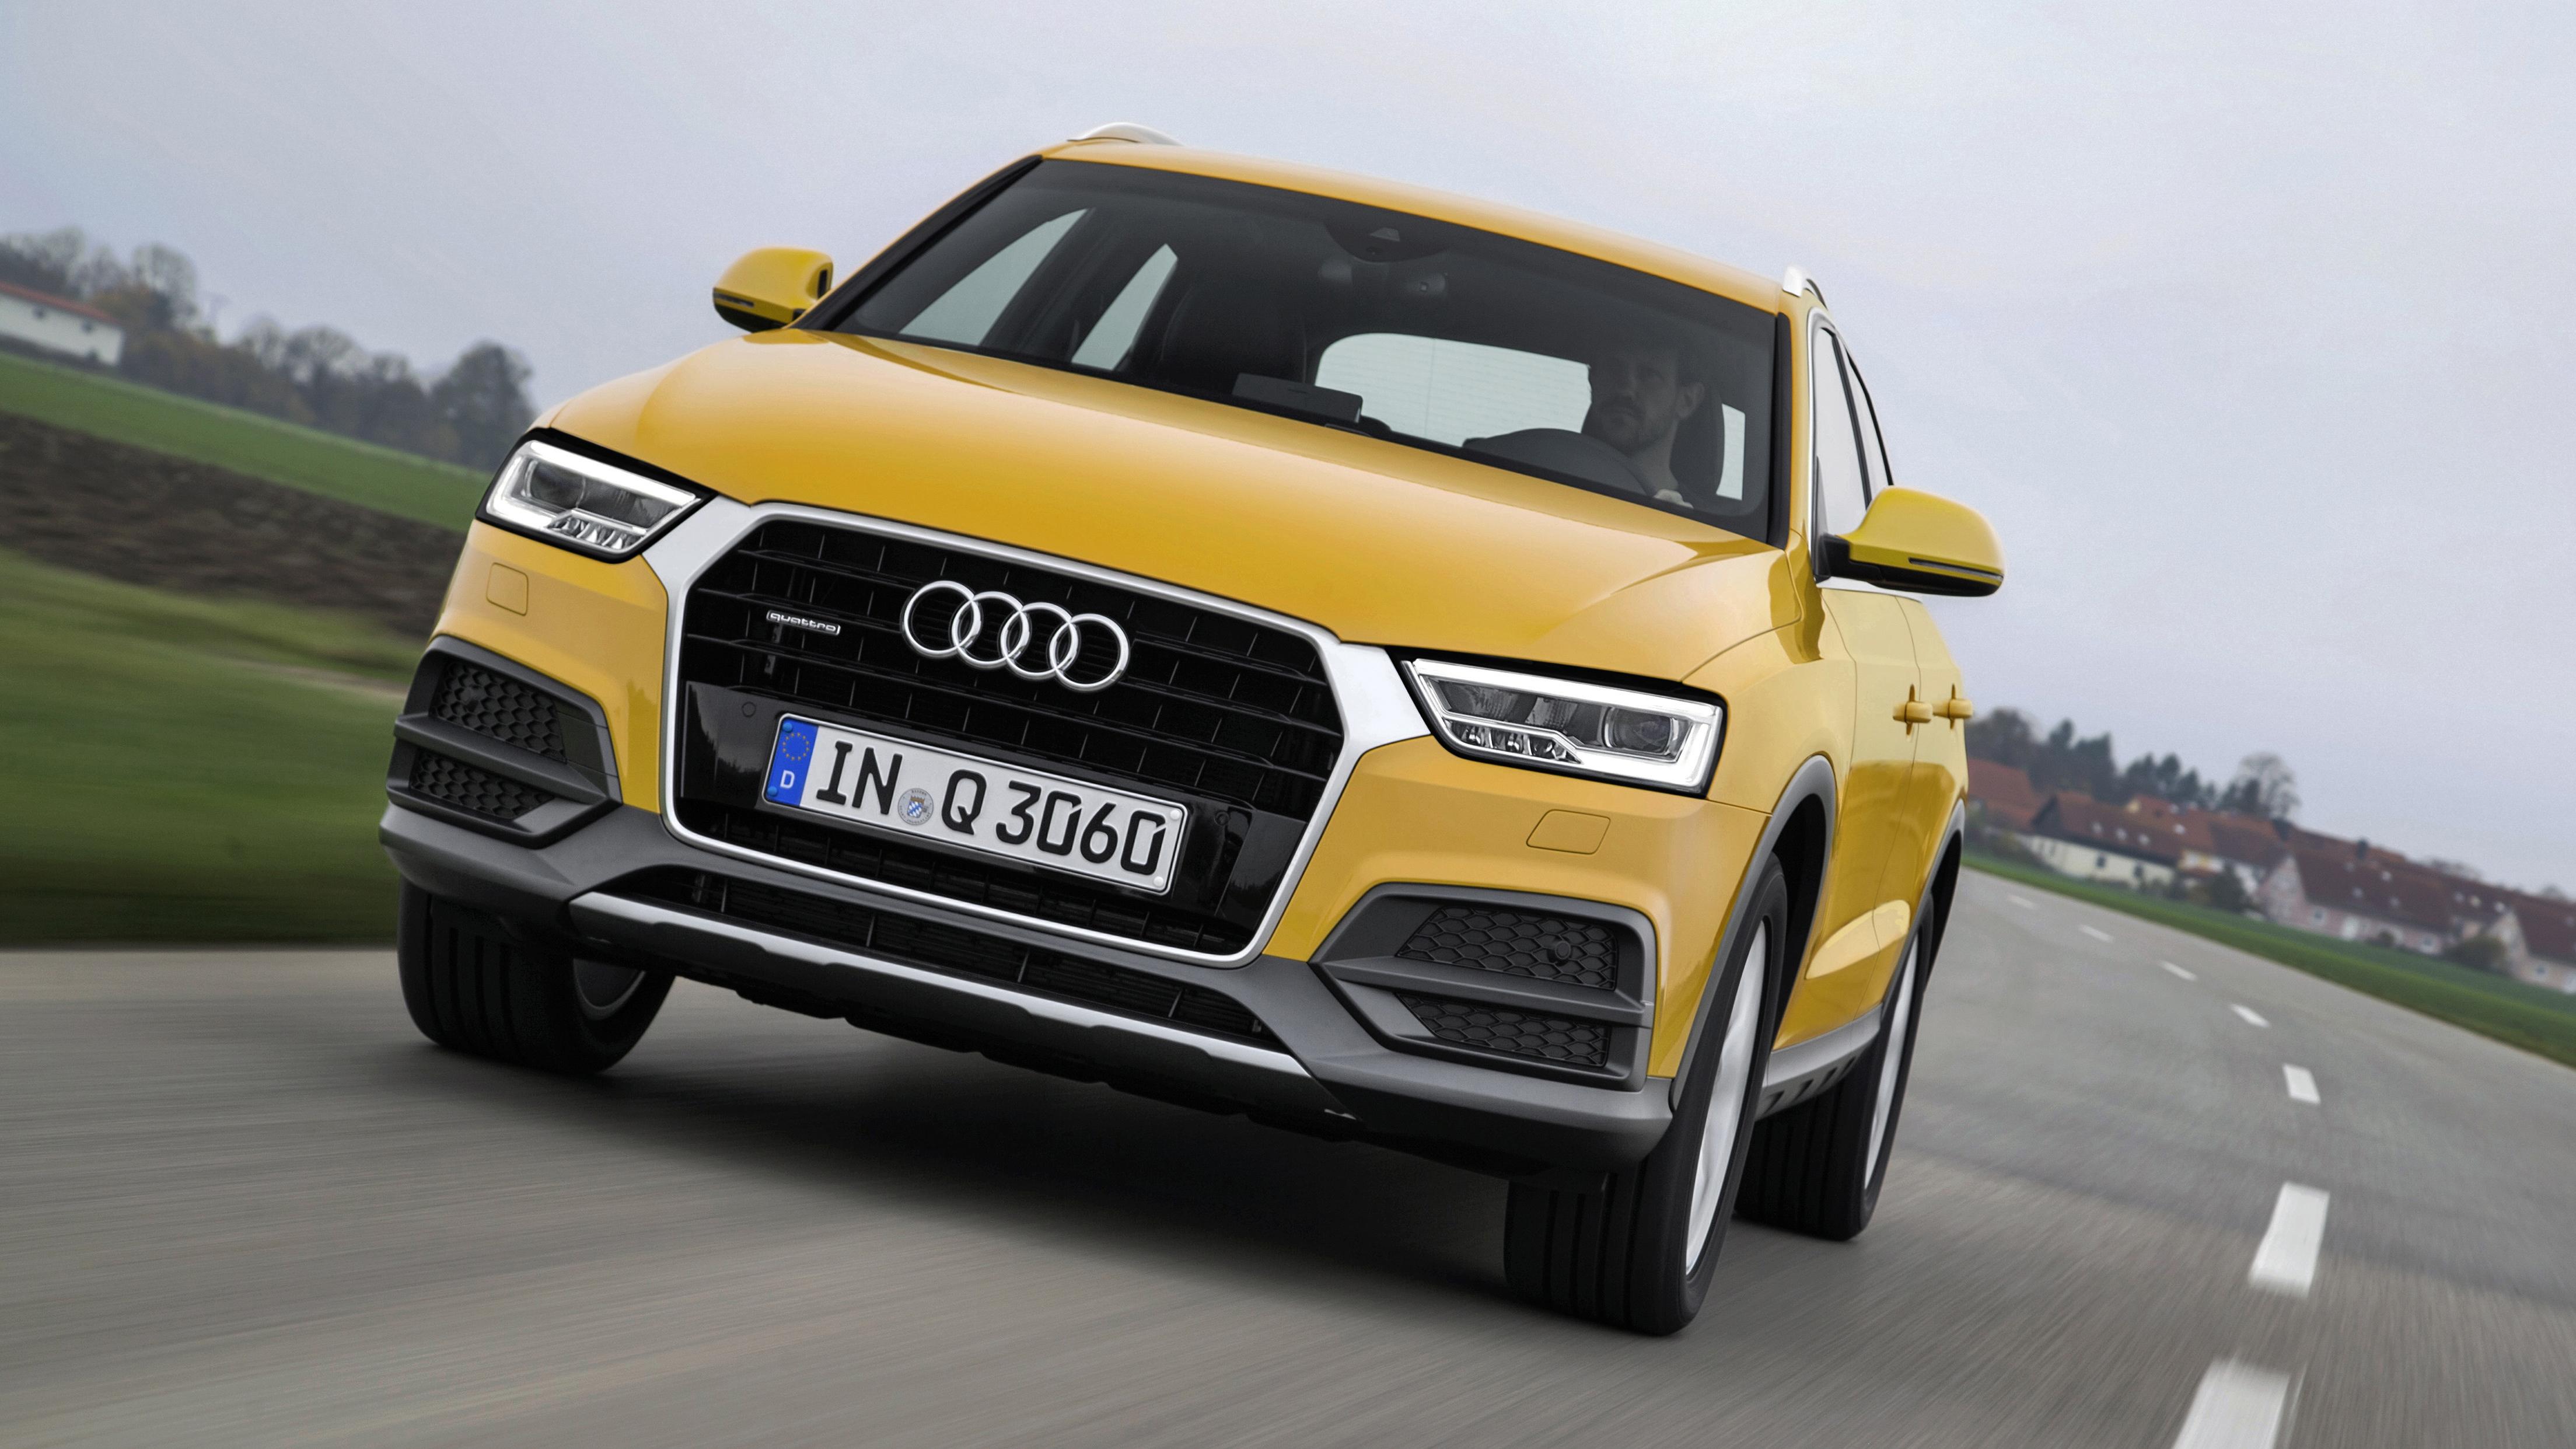 Audi Q3 yellow front